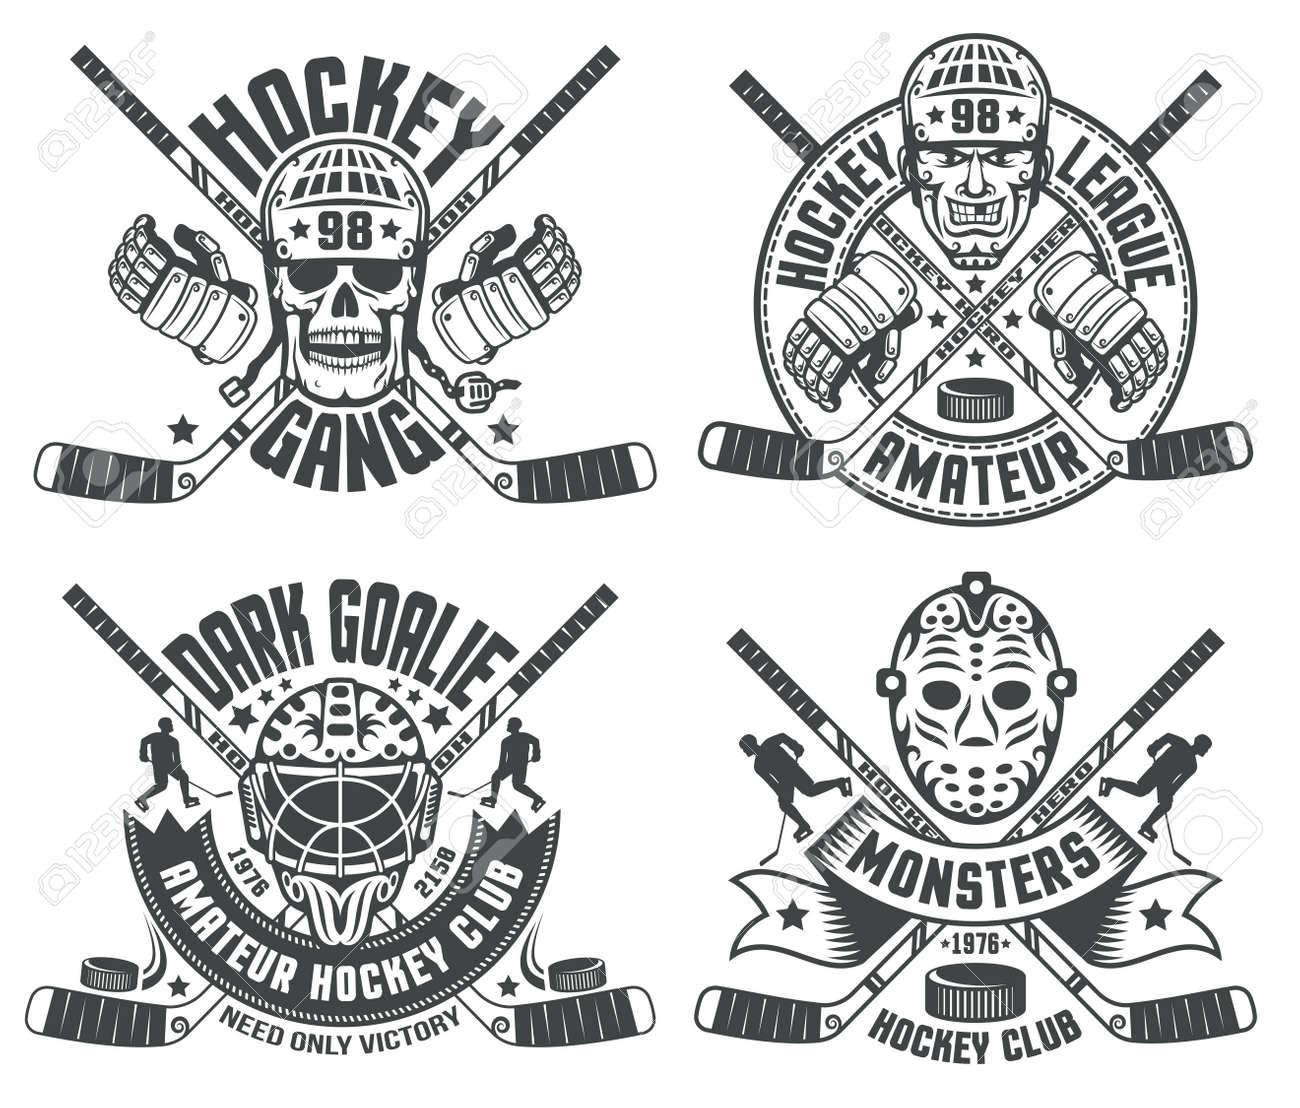 Hockey Logos With Helmets Goalie Masks Sticks Hockey Gauntlet